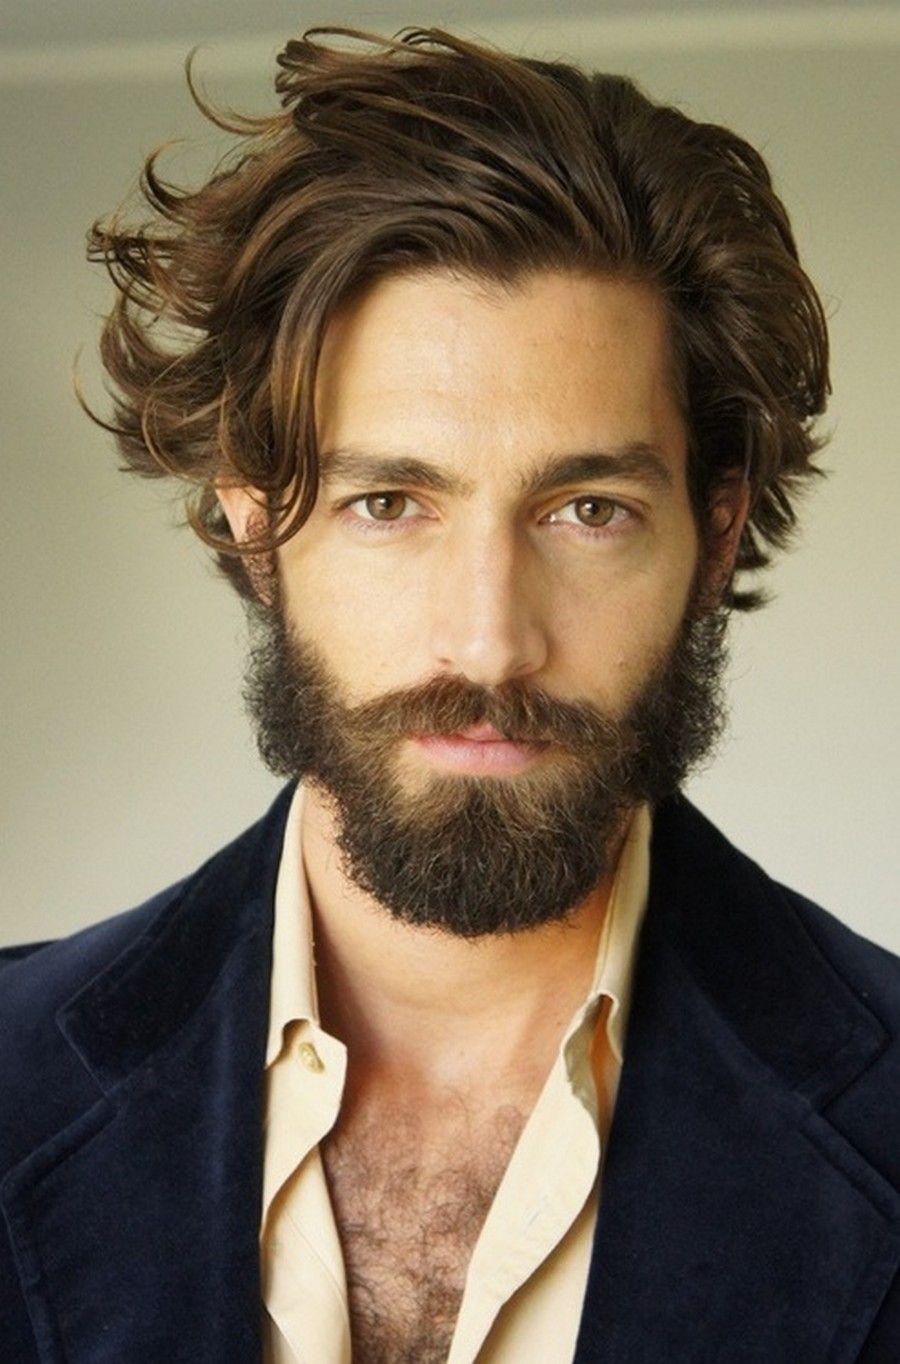 Pin By Jordan Woosley On Hair Goals Mens Hairstyles Medium Medium Hair Styles Mens Hairstyles